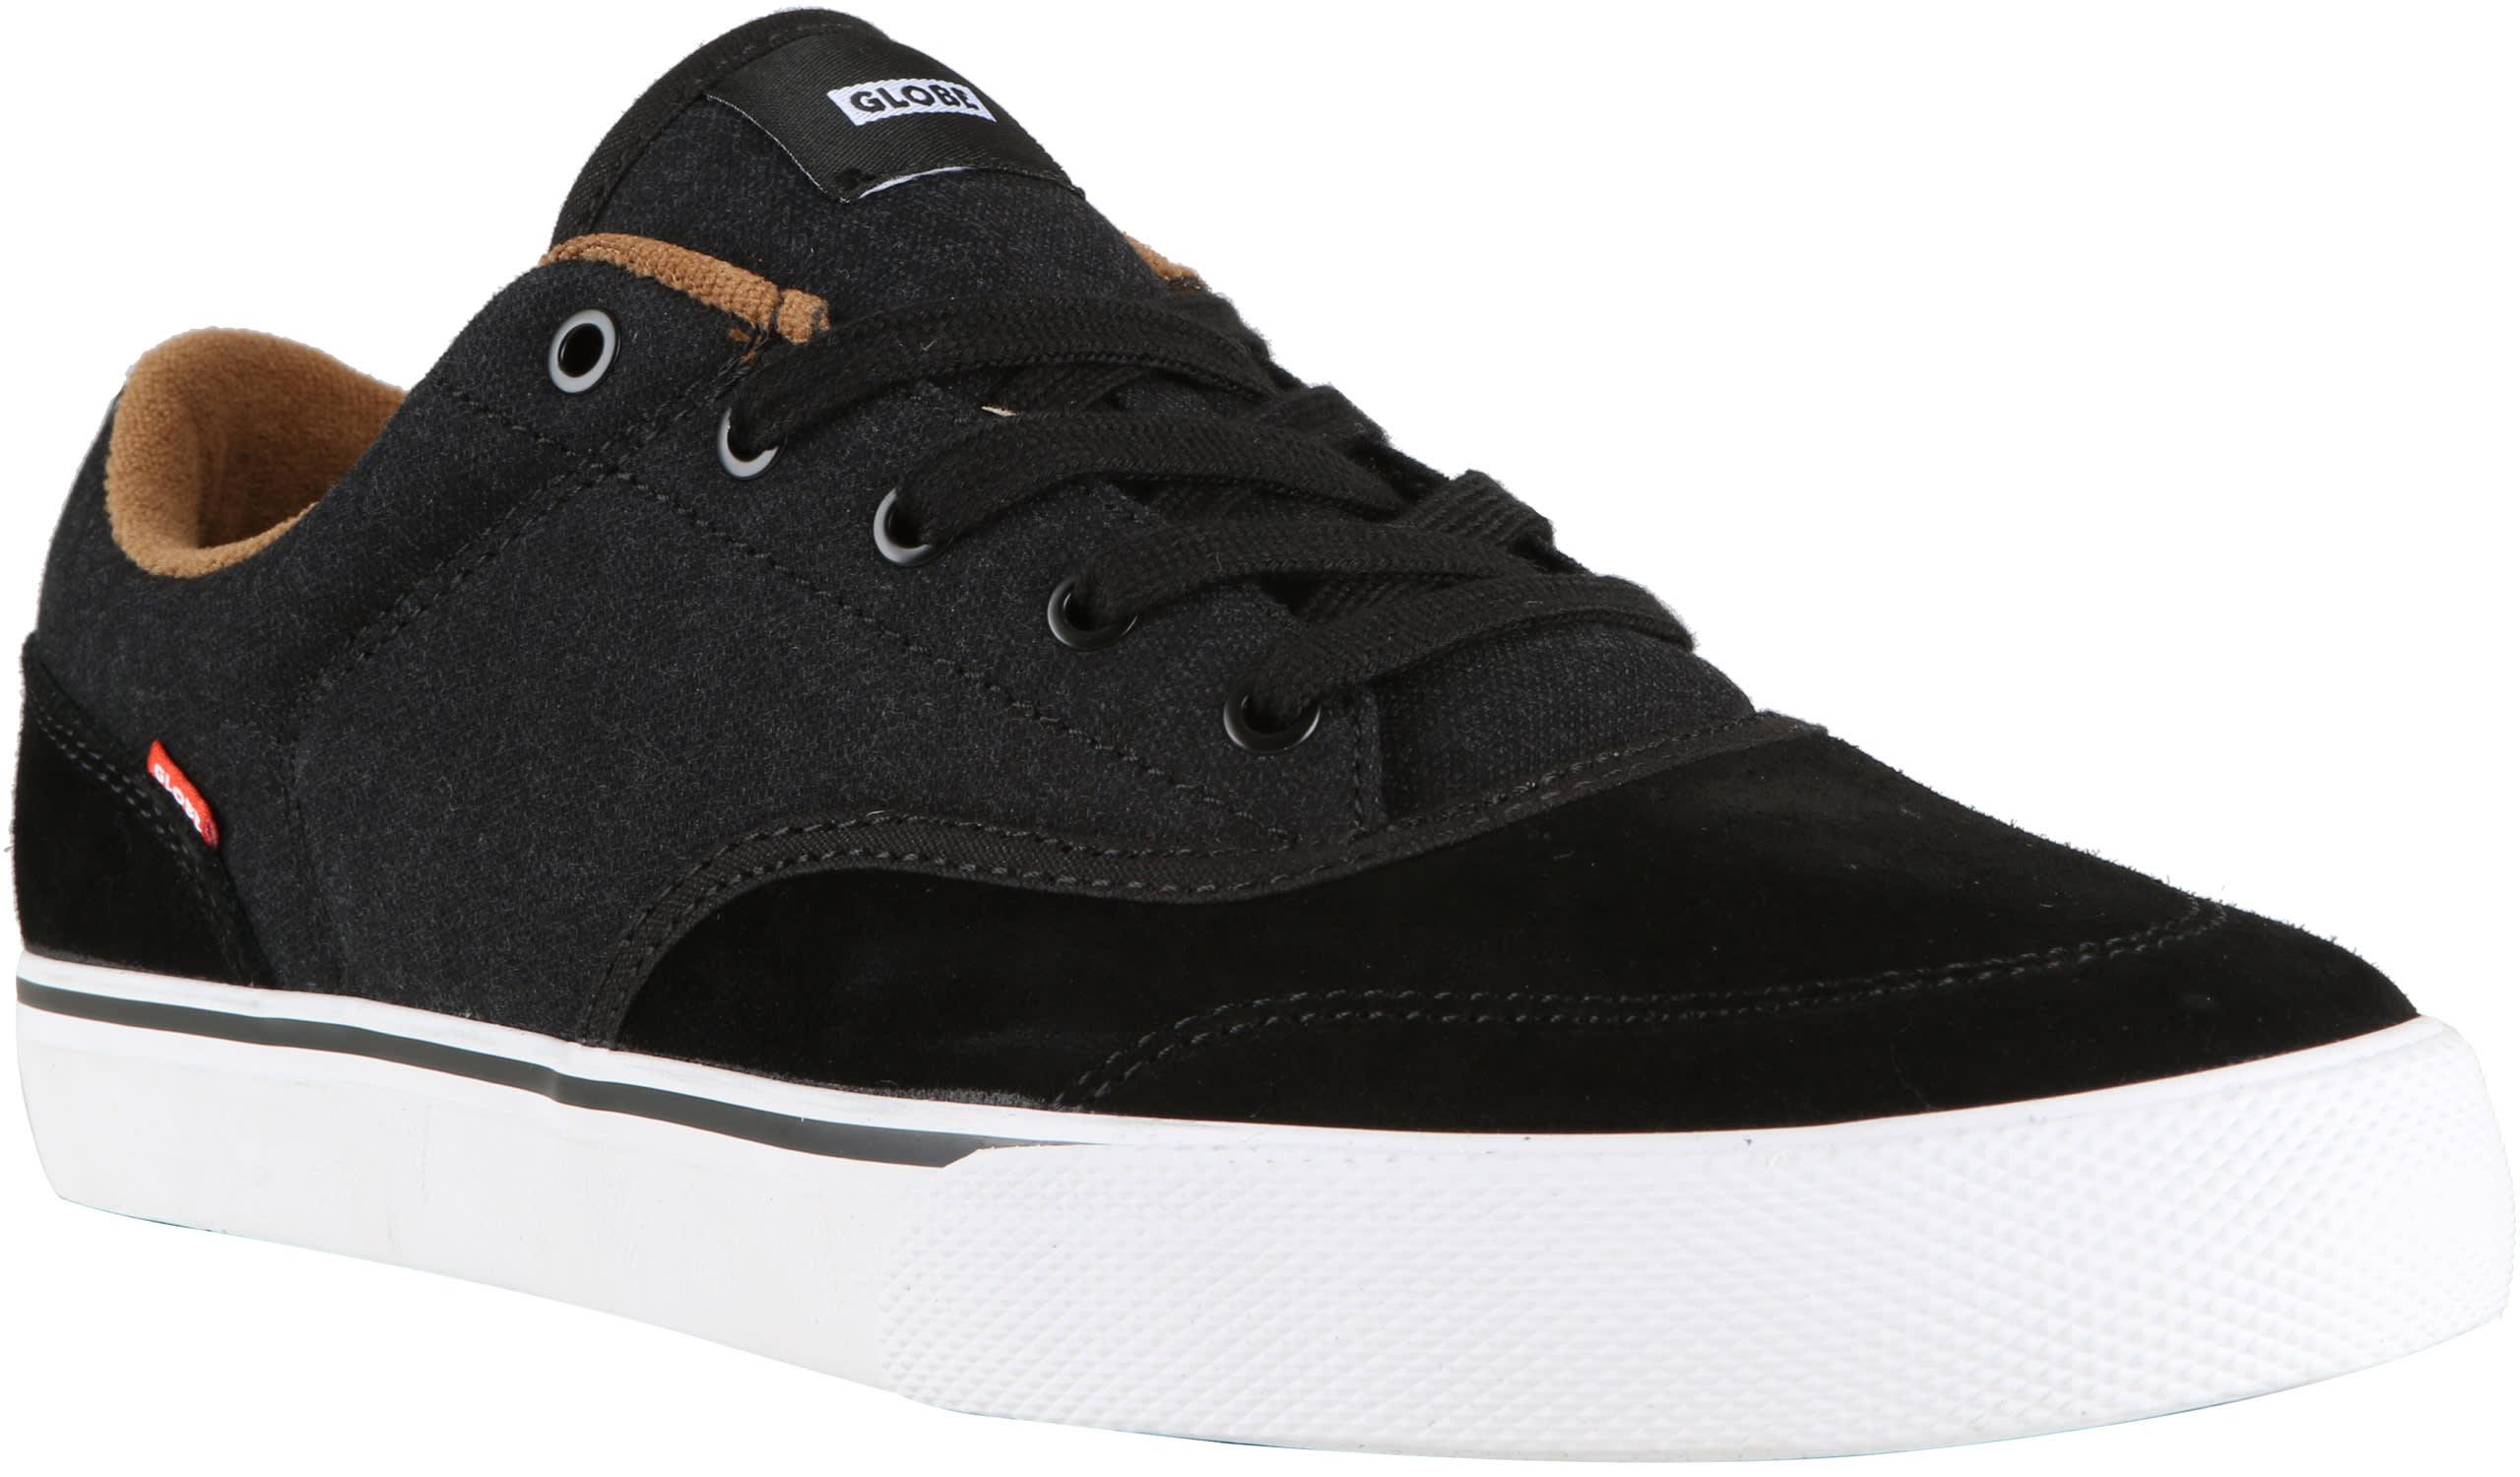 56eec2f55f7f15 Globe-Tribe-Skate-Shoes-Mens thumbnail 6